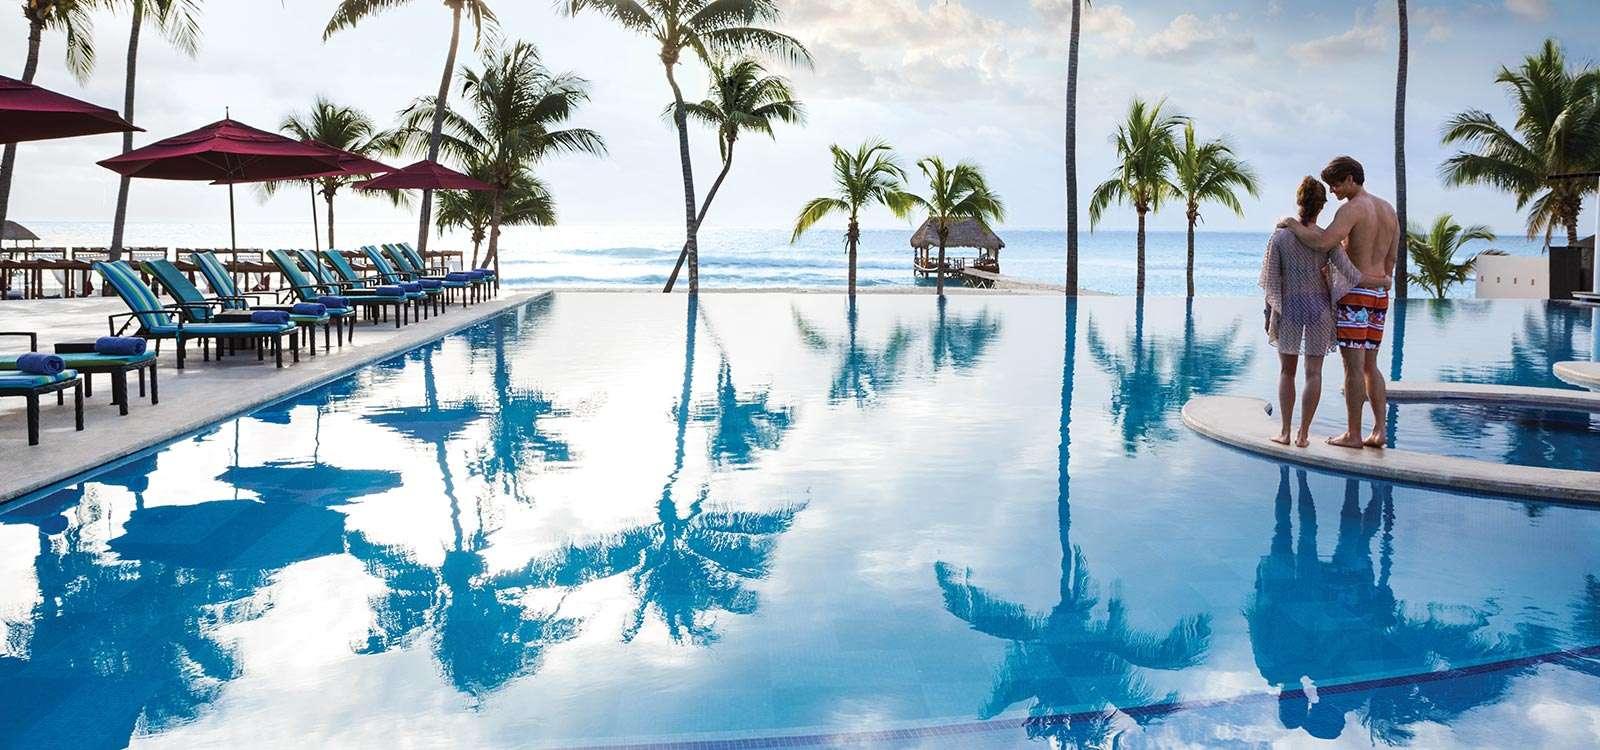 Azul Beach Resort The Fives Playa Del Carmen, Riviera Maya, Mexico